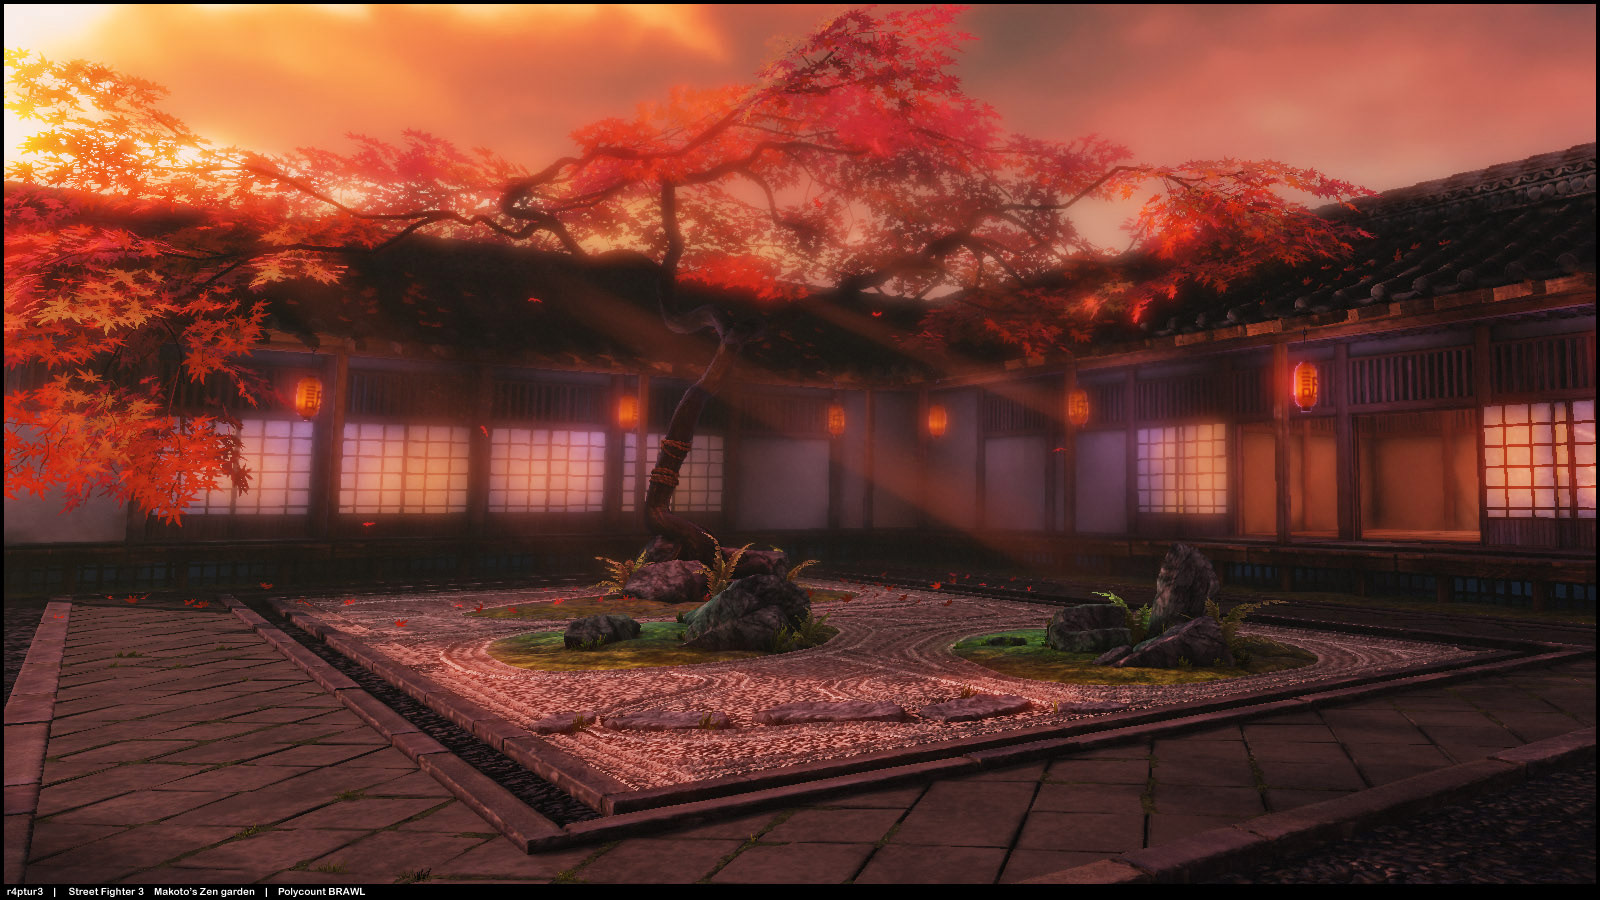 Makoto Street Fighter 3 stage reimagined image #2